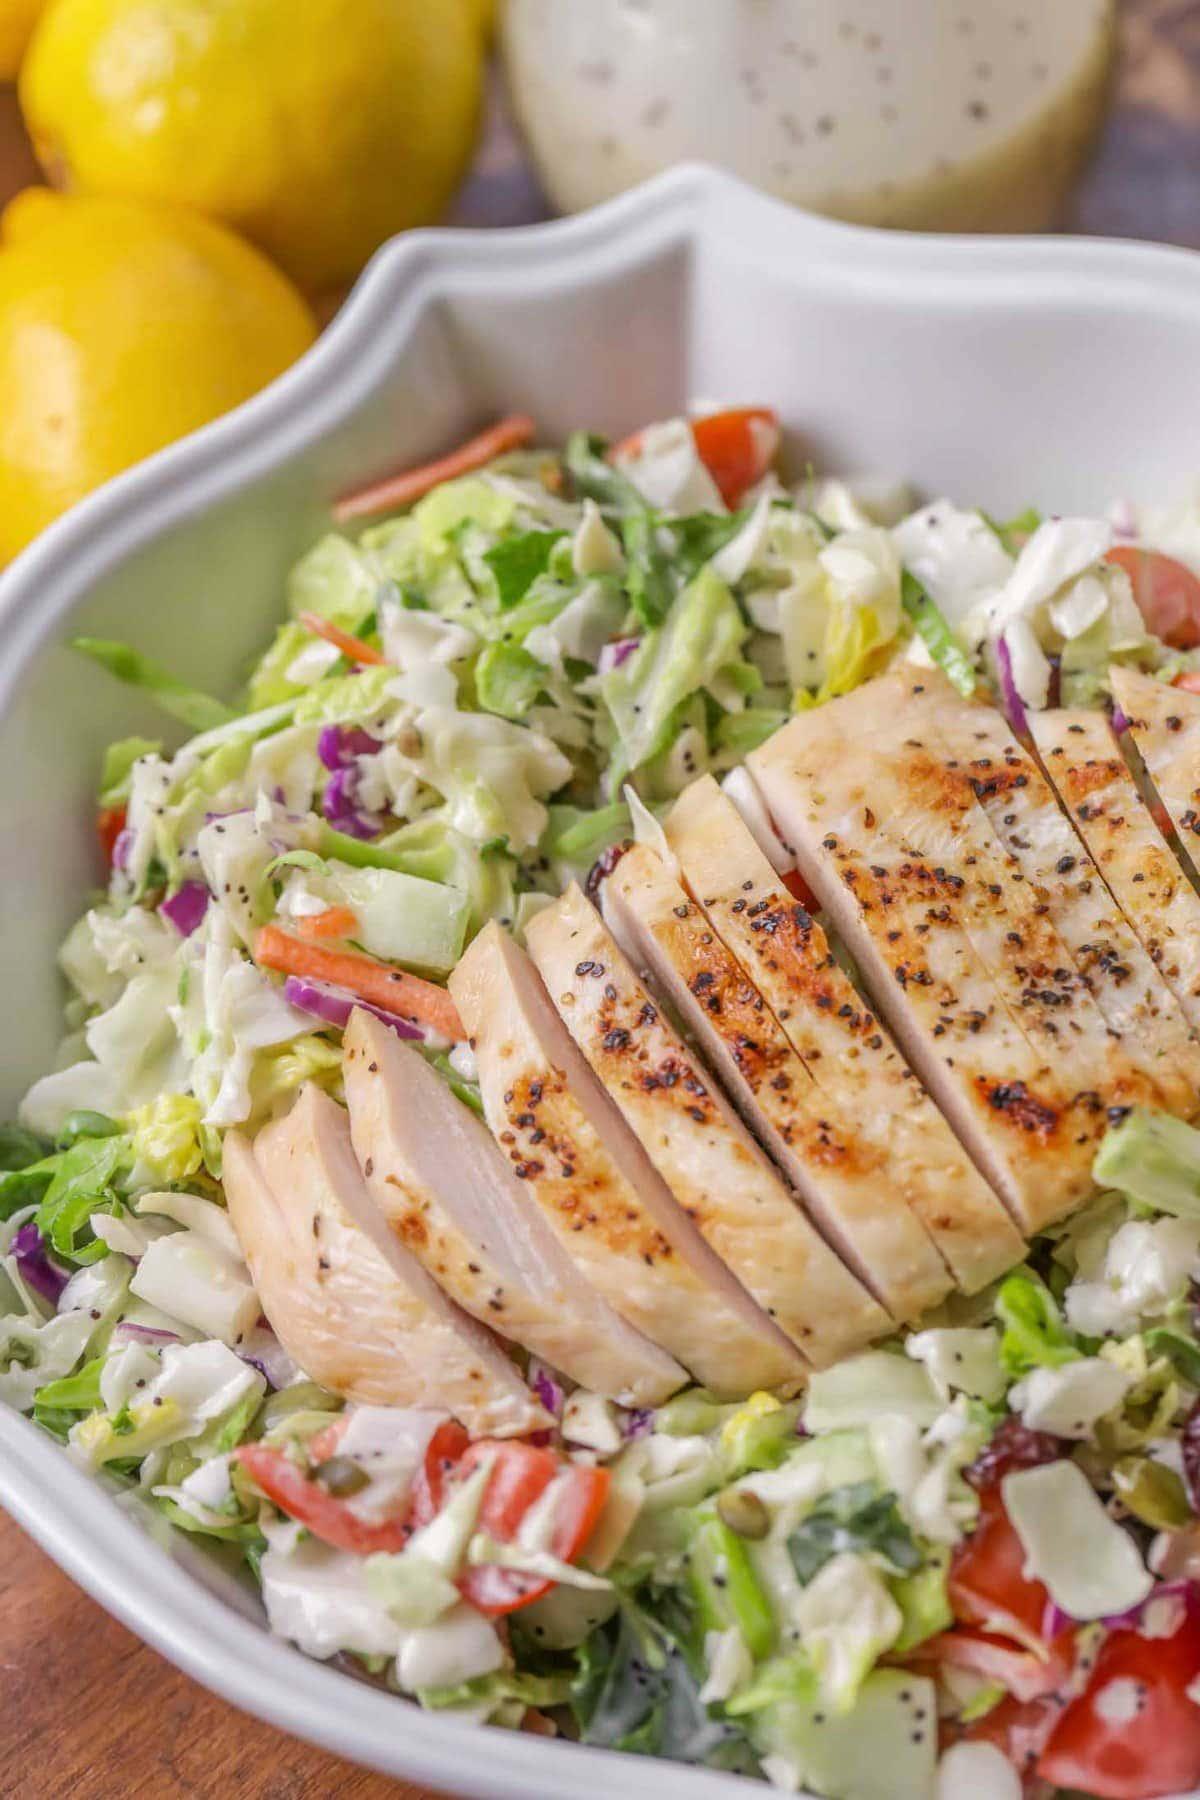 Lemon poppyseed dressing salad